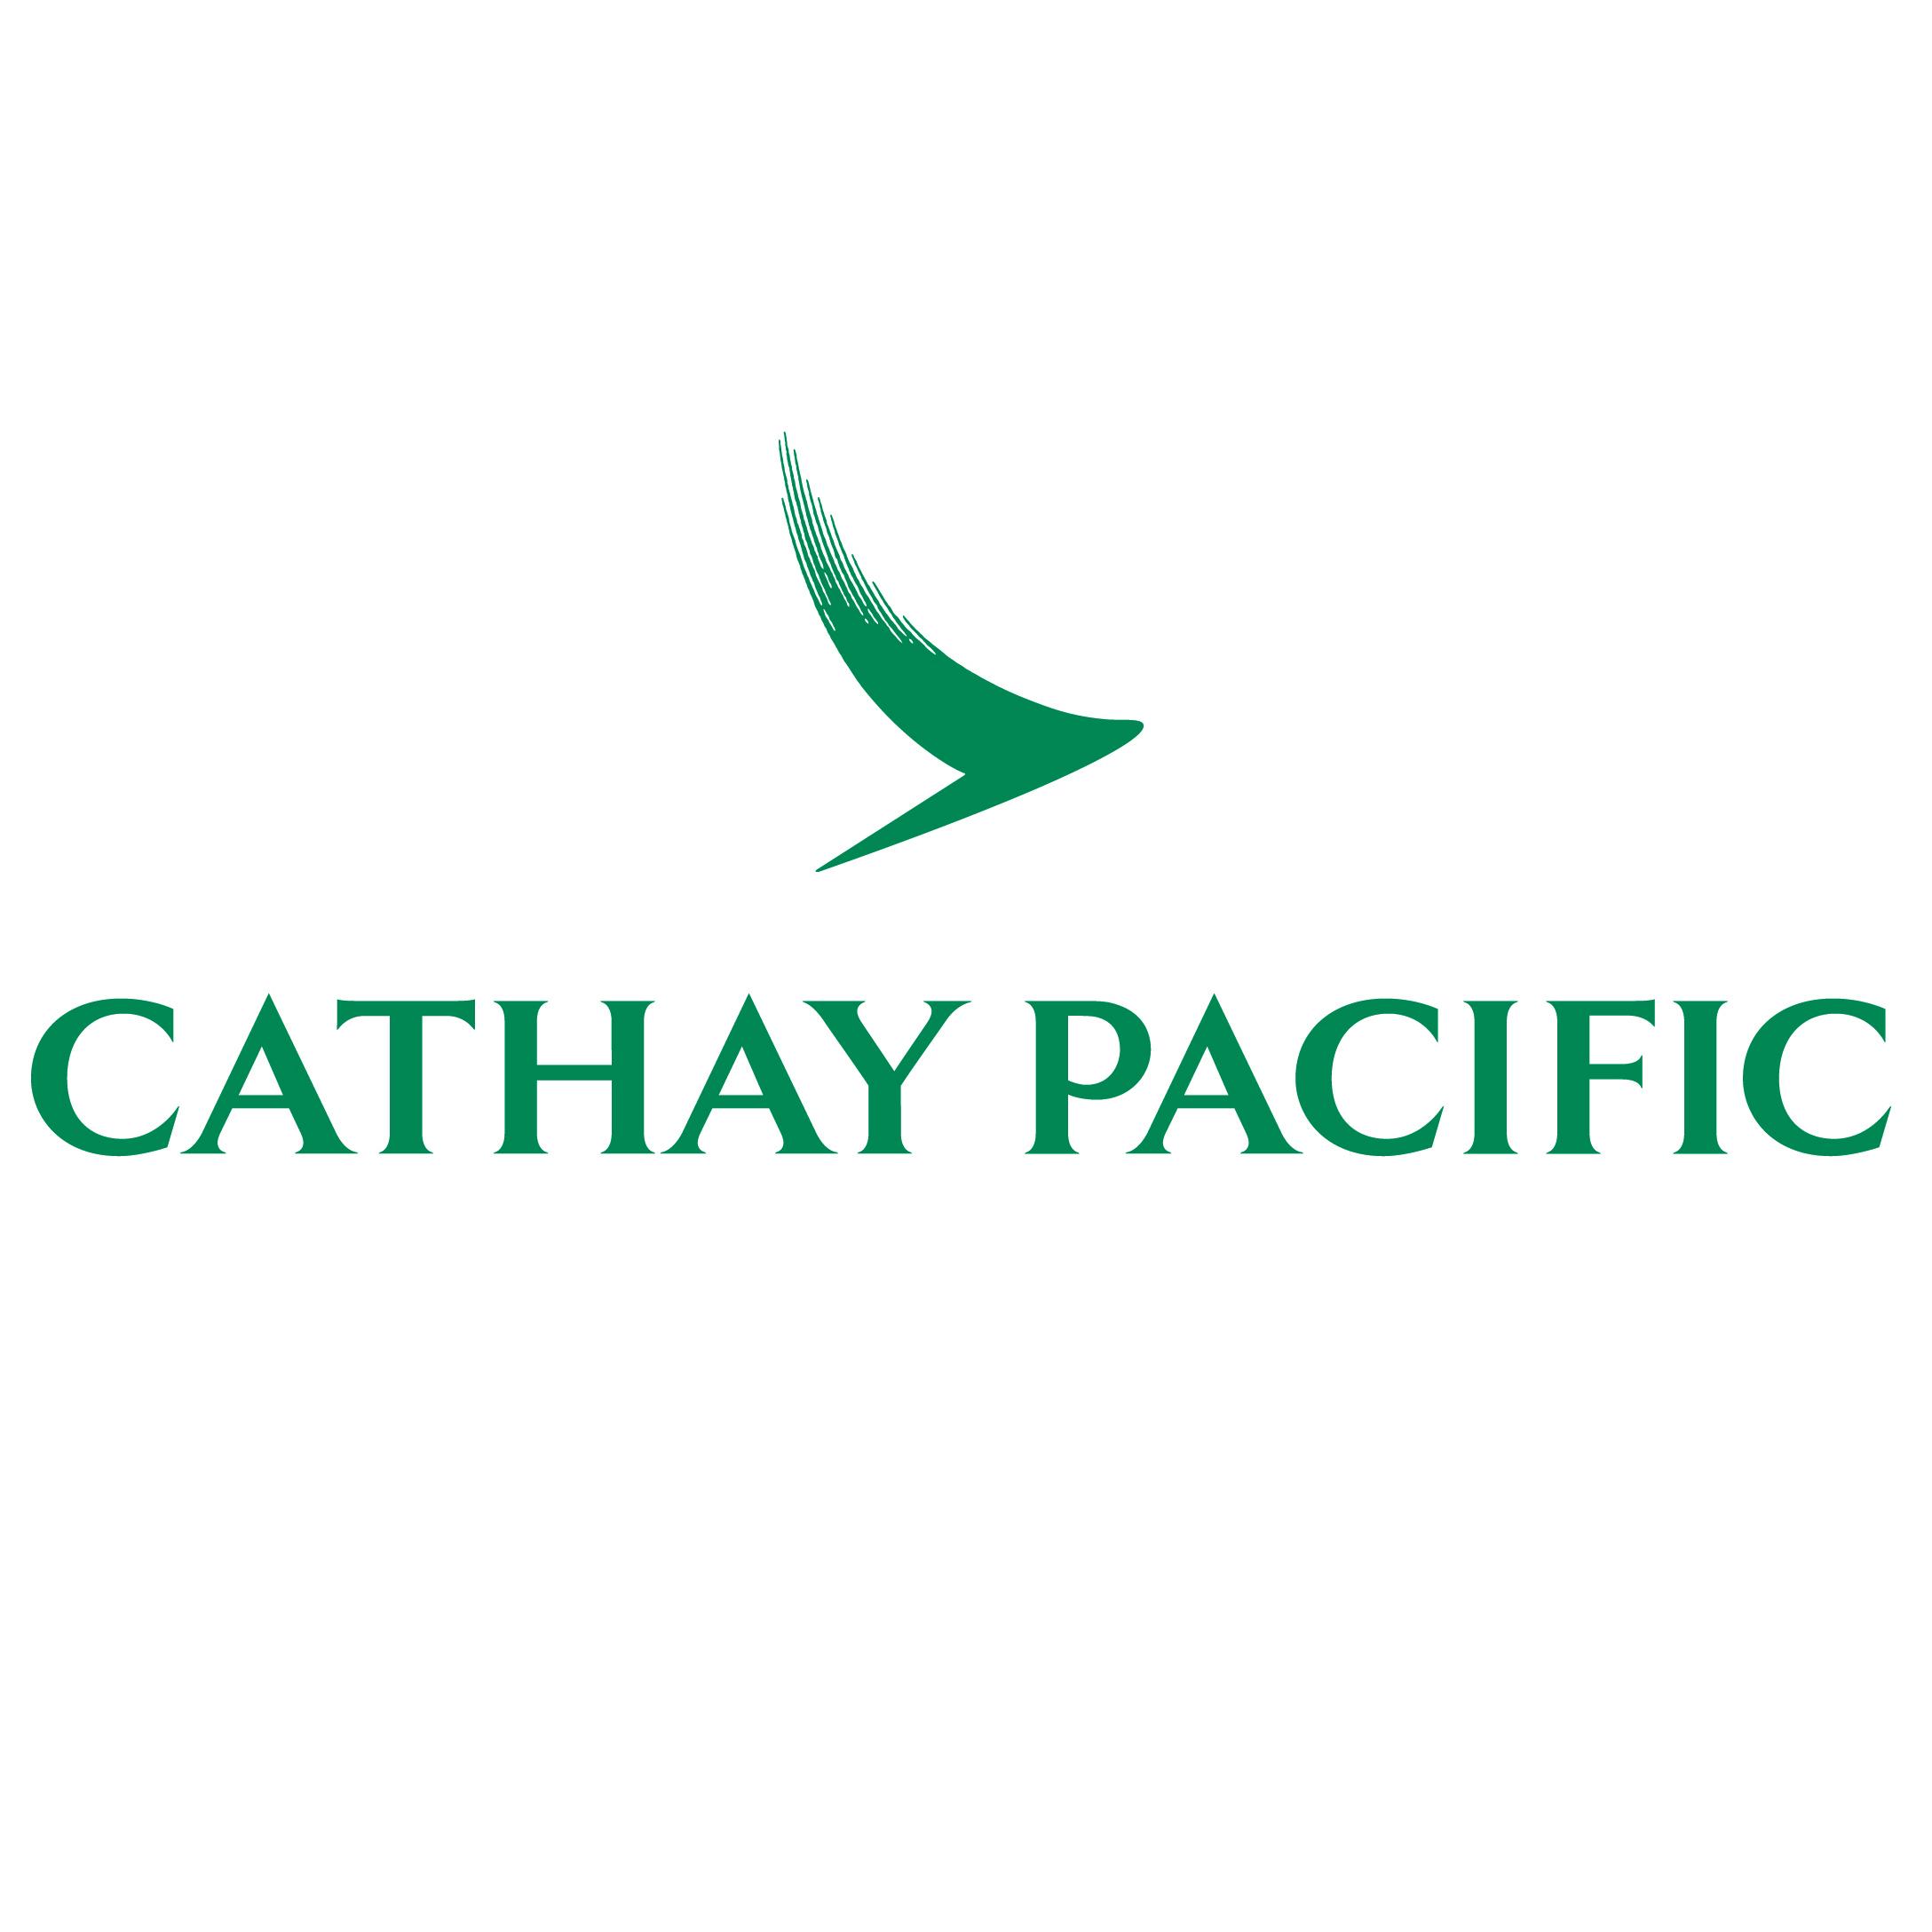 Cathay Pacific_Master Logo_Vertical Green English-01 2.jpg